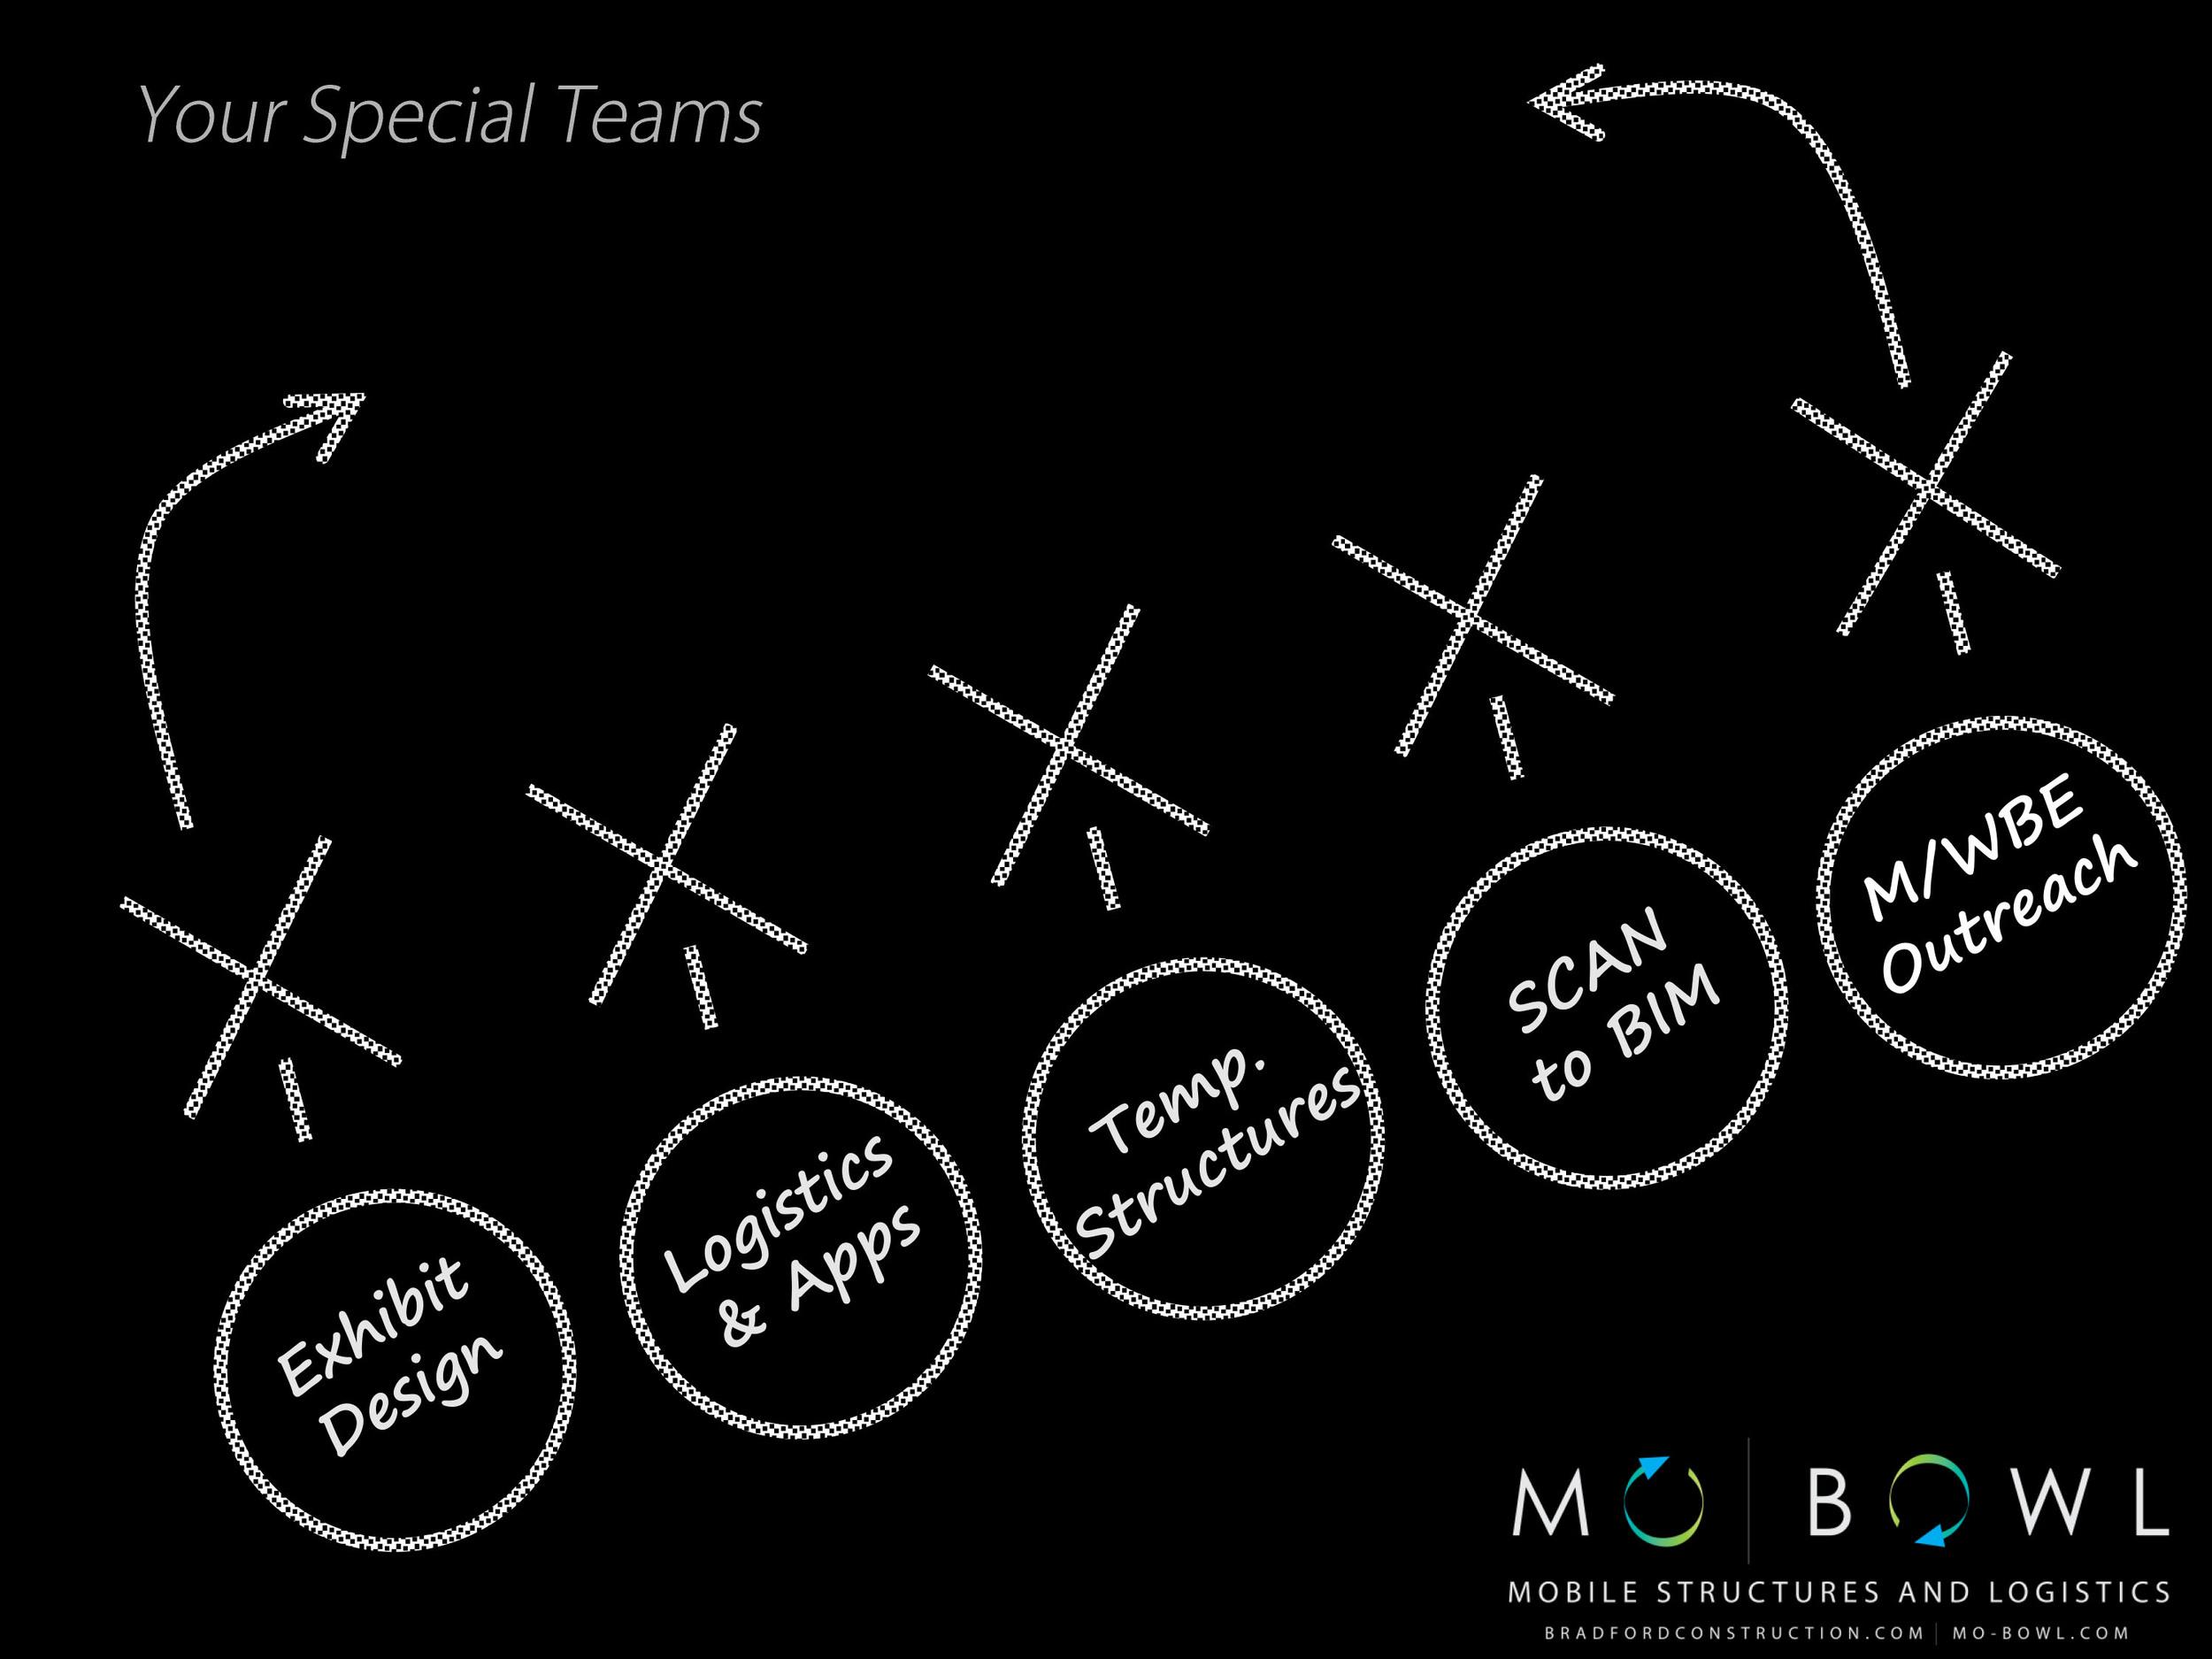 Mobowl_Presentation_final_Ver-14 copy.jpg